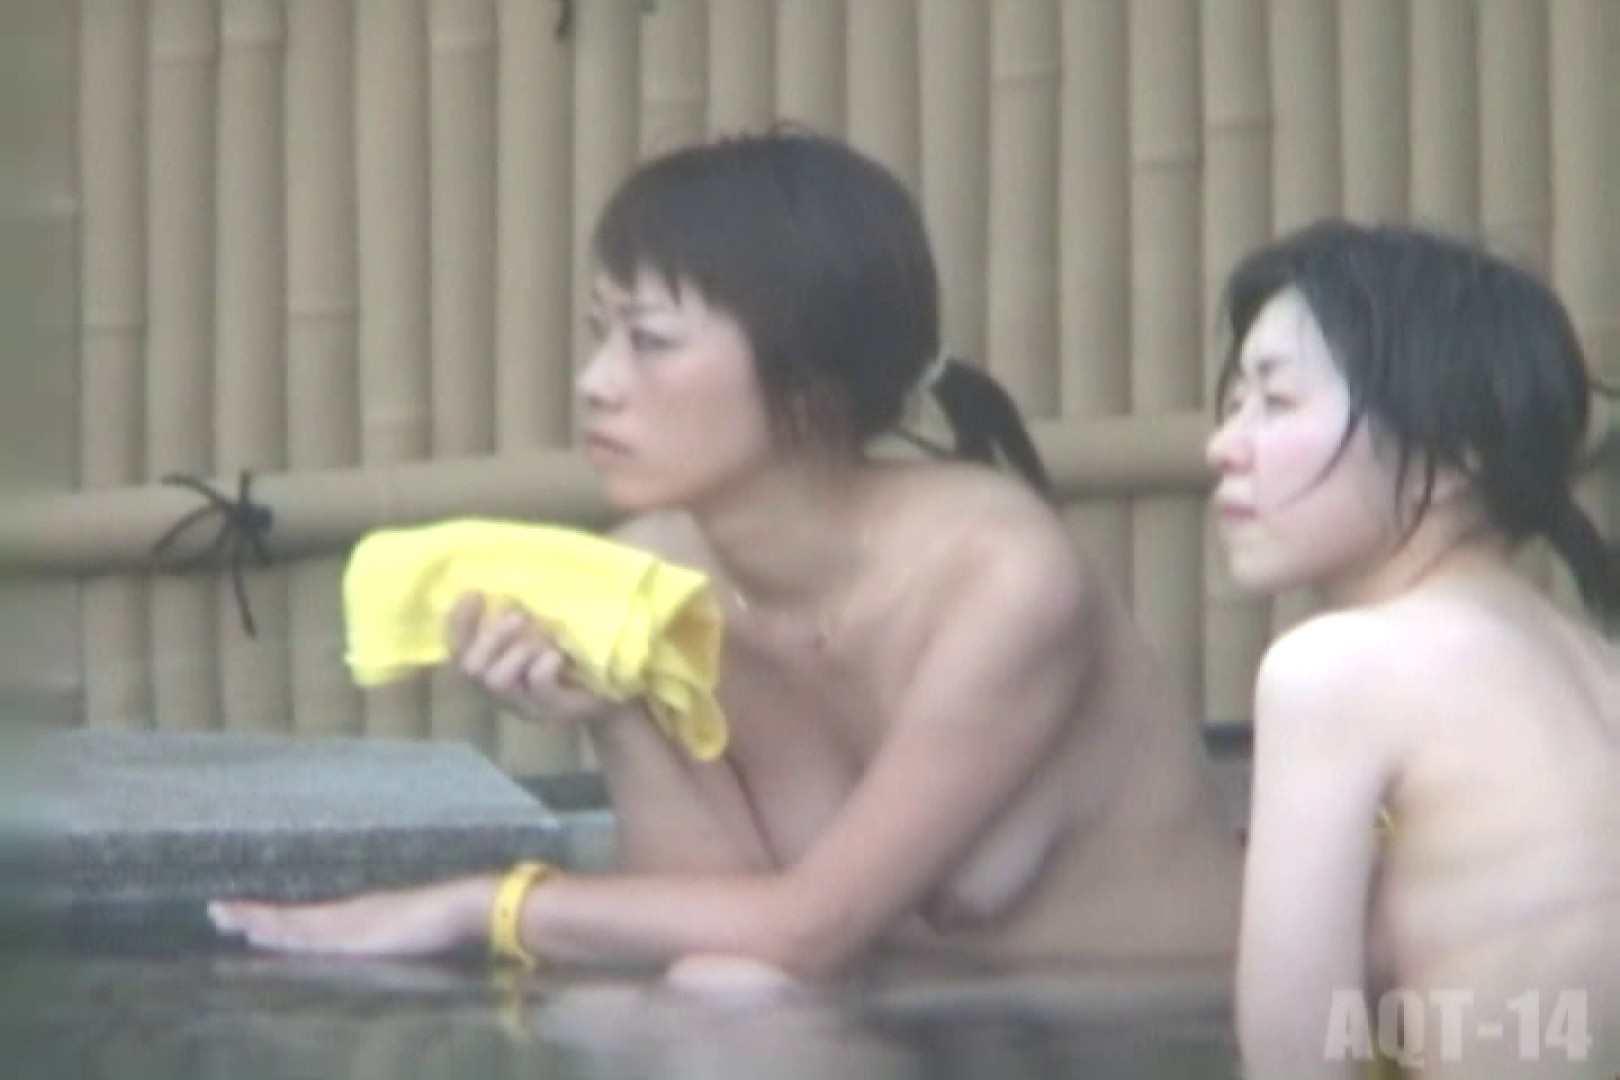 Aquaな露天風呂Vol.828 盗撮シリーズ | 露天風呂編  86PIX 17